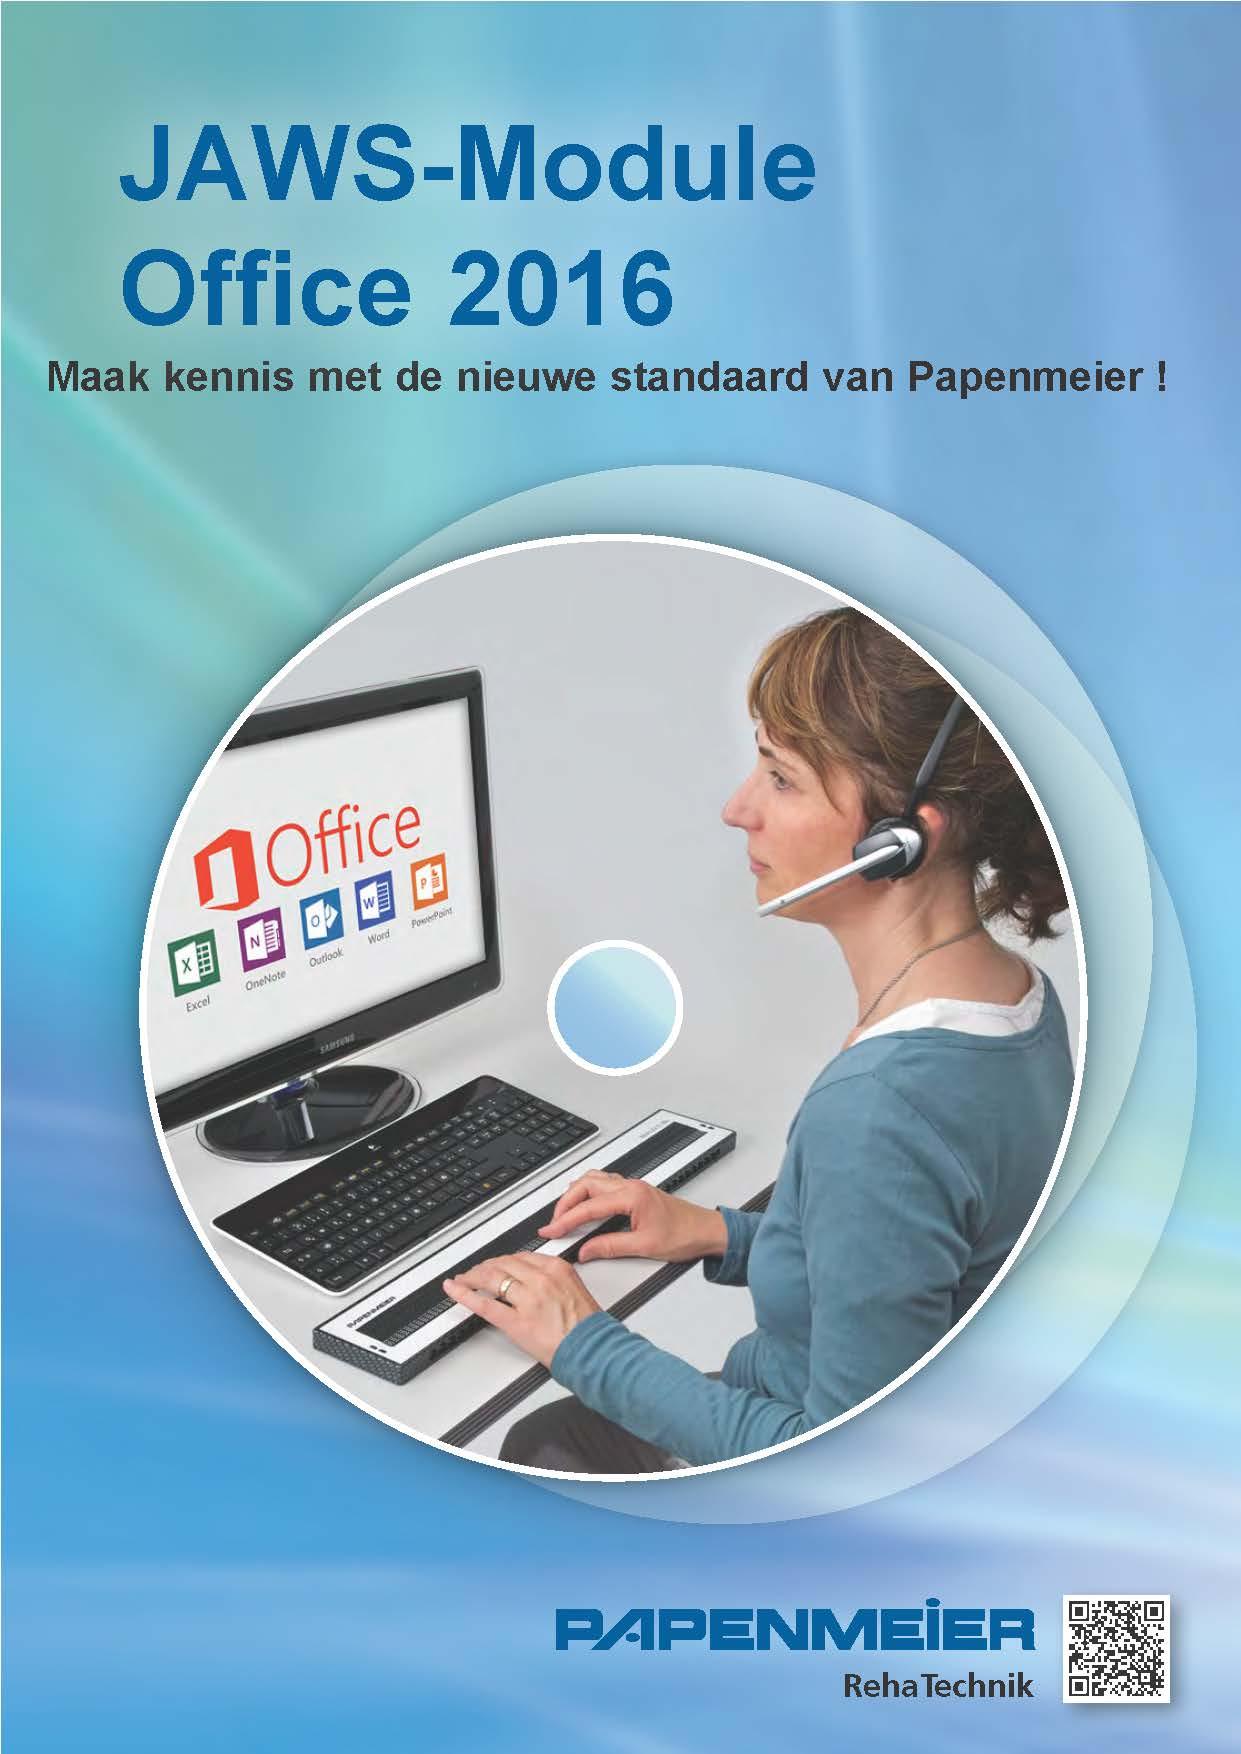 JAWS Module Office 2016